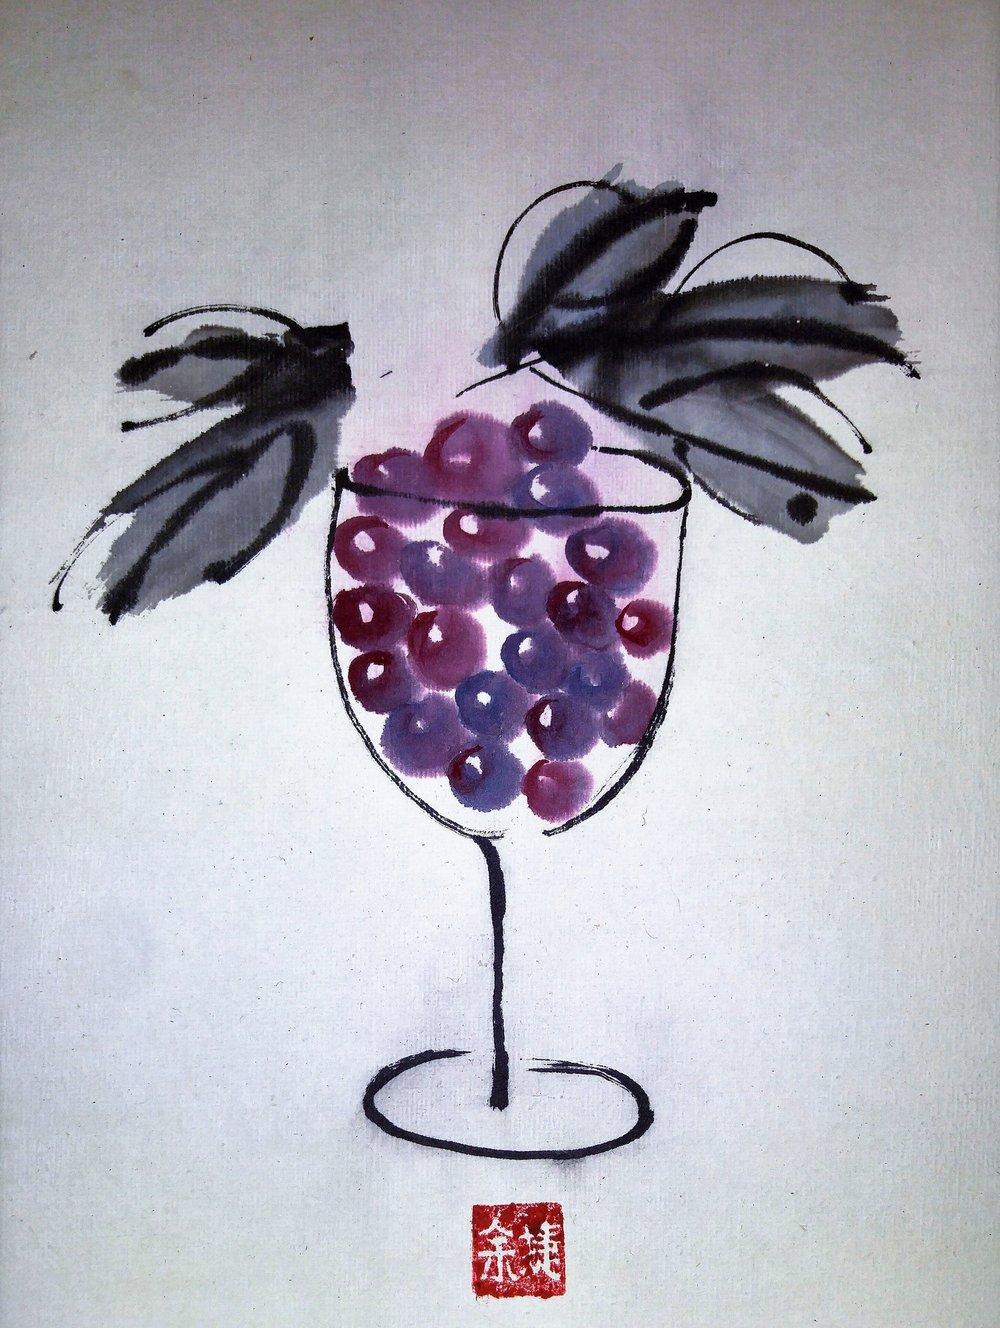 [SOLD] Vino, 9 x 12 x 0.75 inches